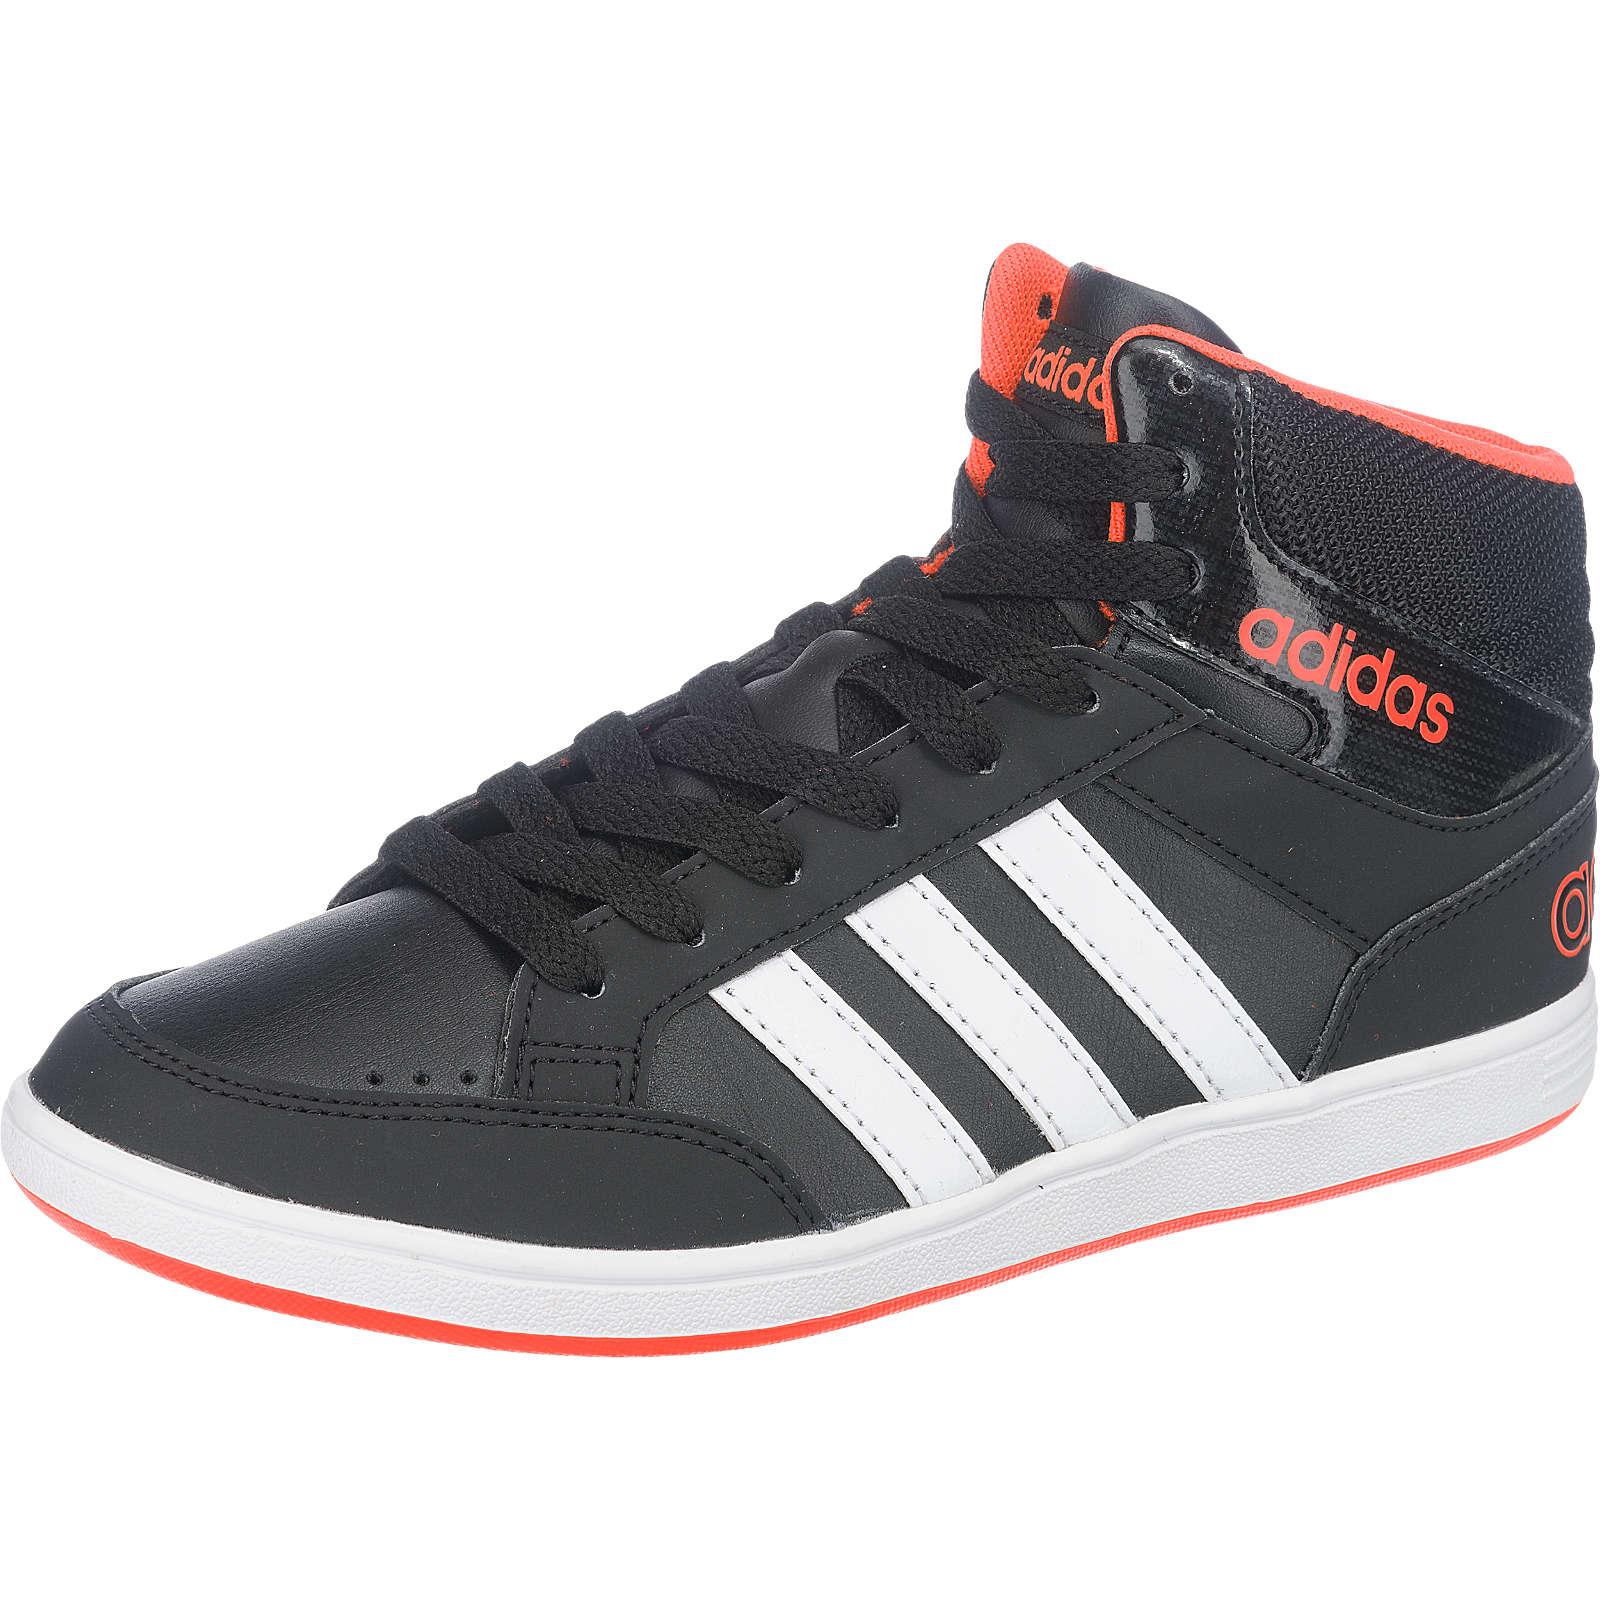 adidas NEO Sneakers High HOOPS MID Gr. 33 Jungen Kinder jetztbilligerkaufen